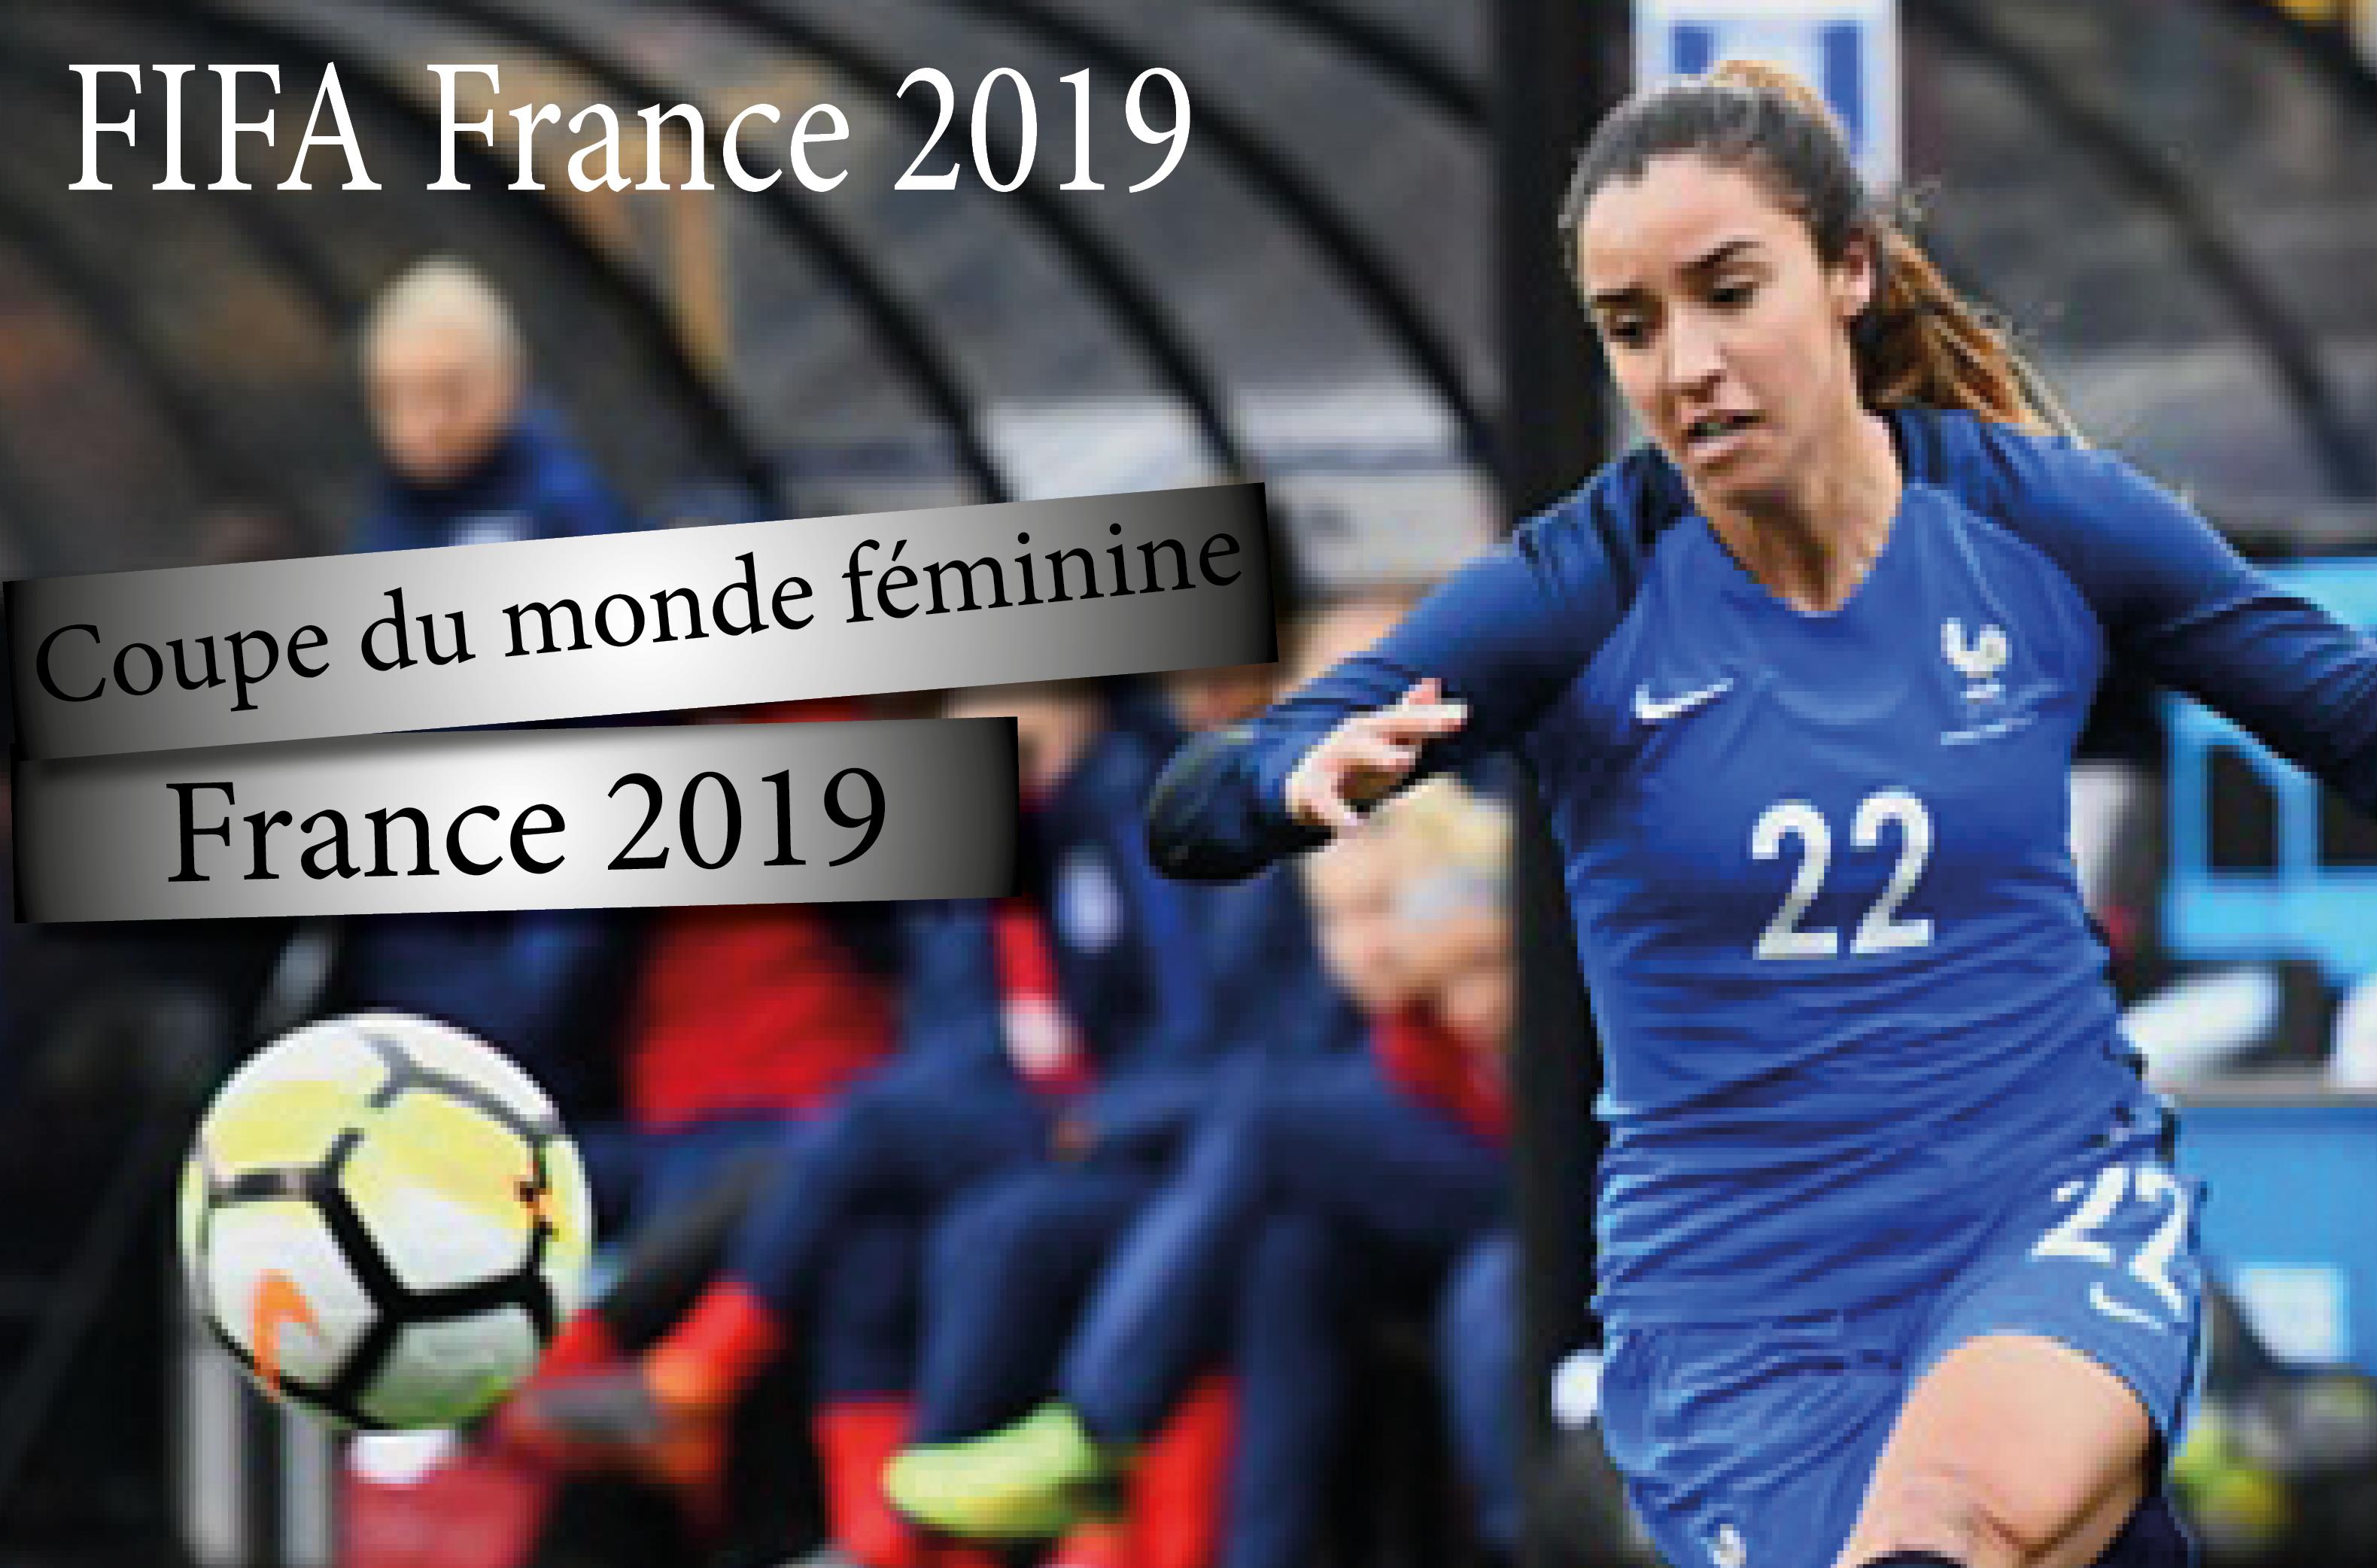 Coupe du monde femine